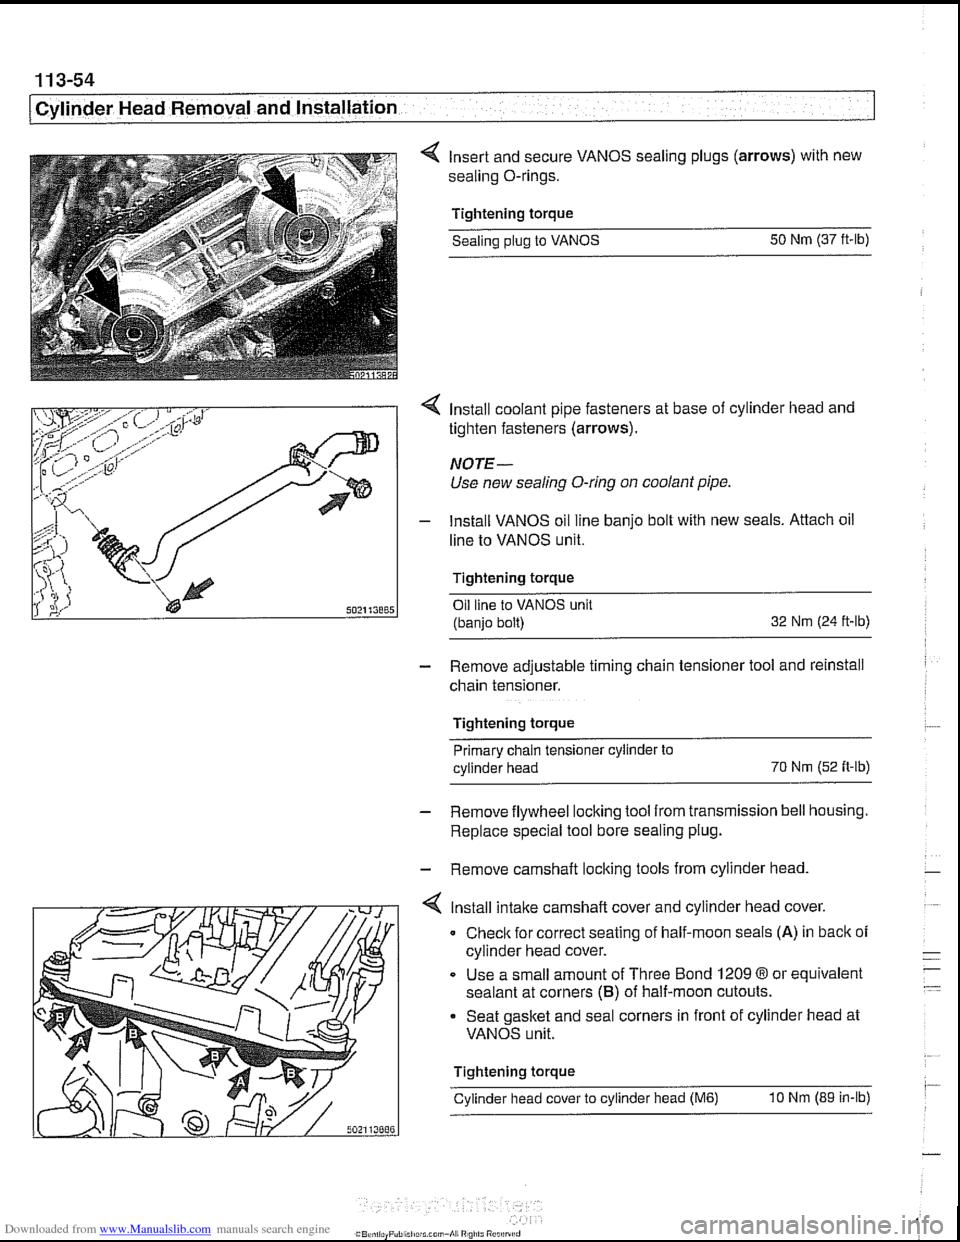 Engine Coolant Bmw 530i 2001 E39 Workshop Manual Diagram Page 148